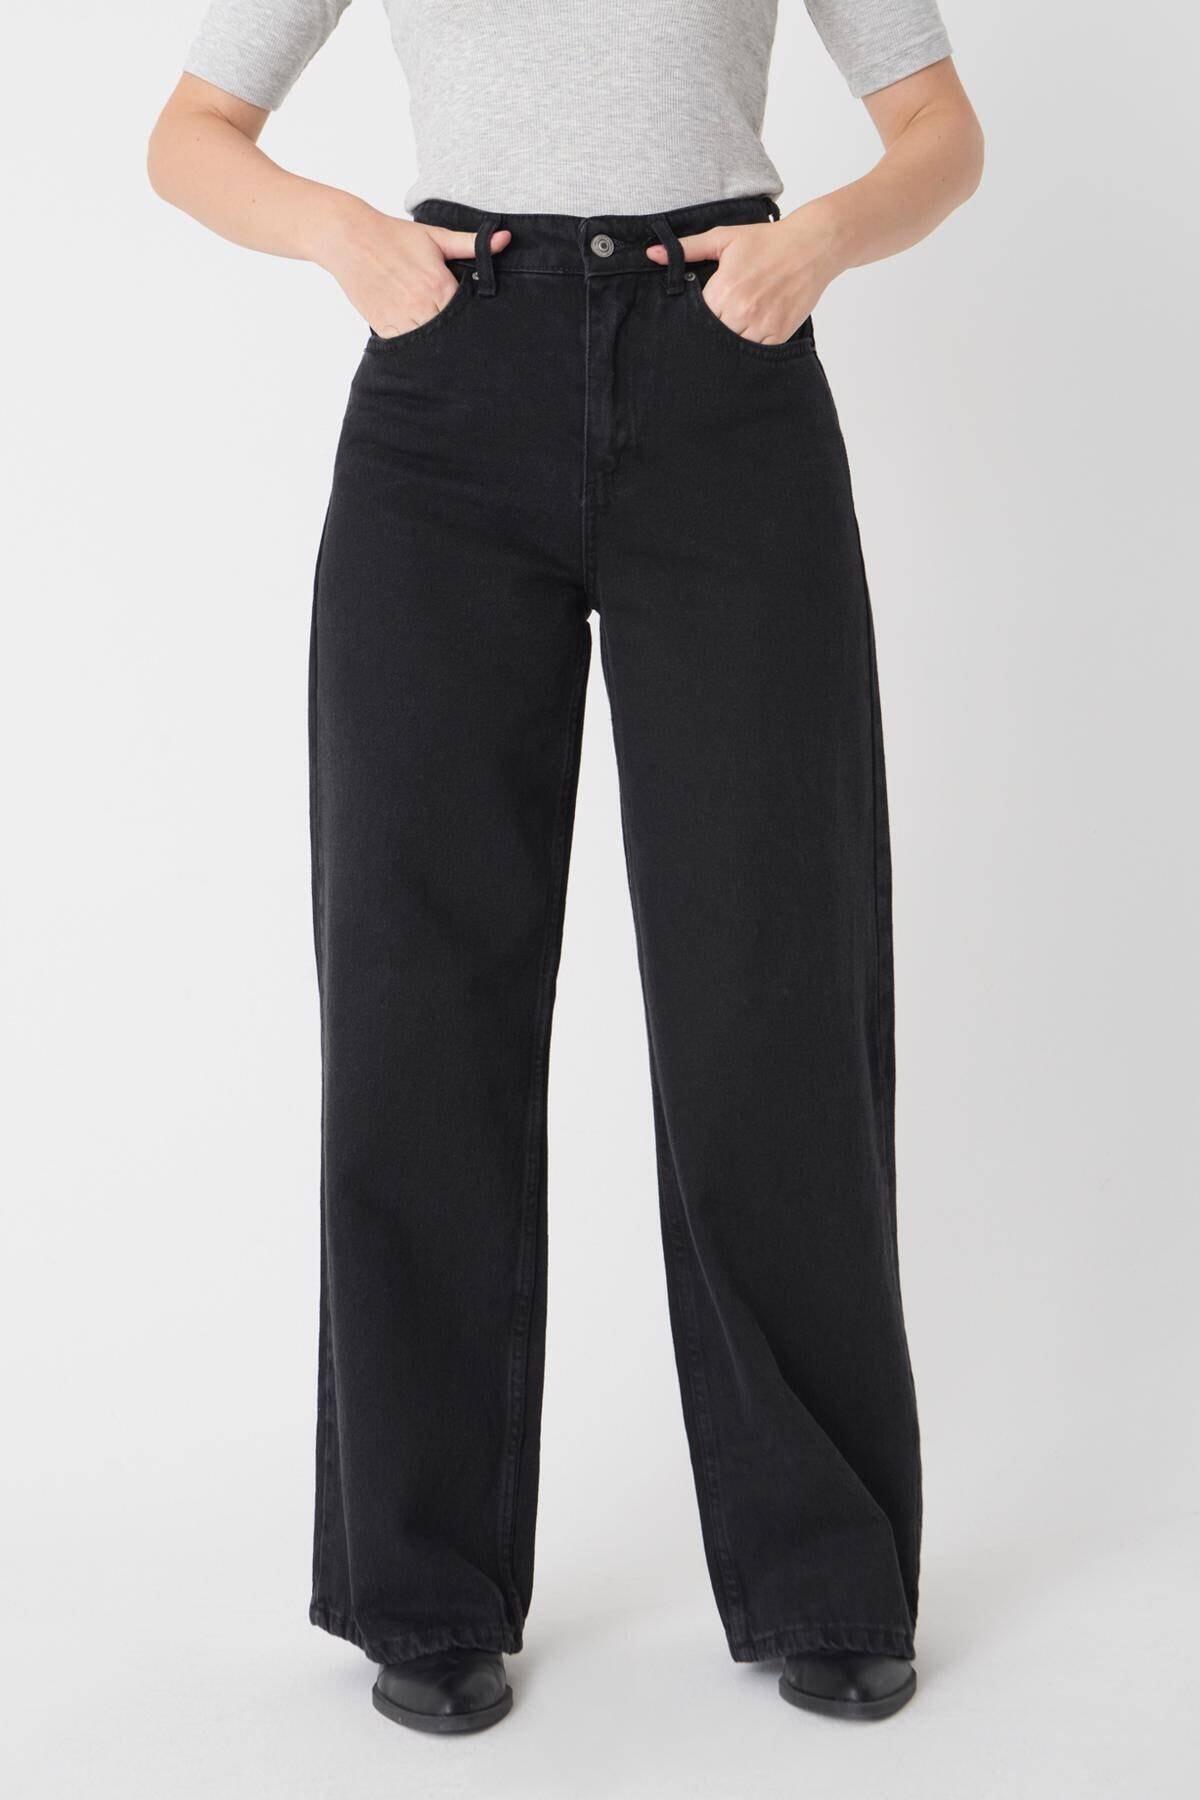 Addax Kadın Füme Cep Detaylı Bol Paça Pantolon Pn1072 - Pni ADX-0000023093 2